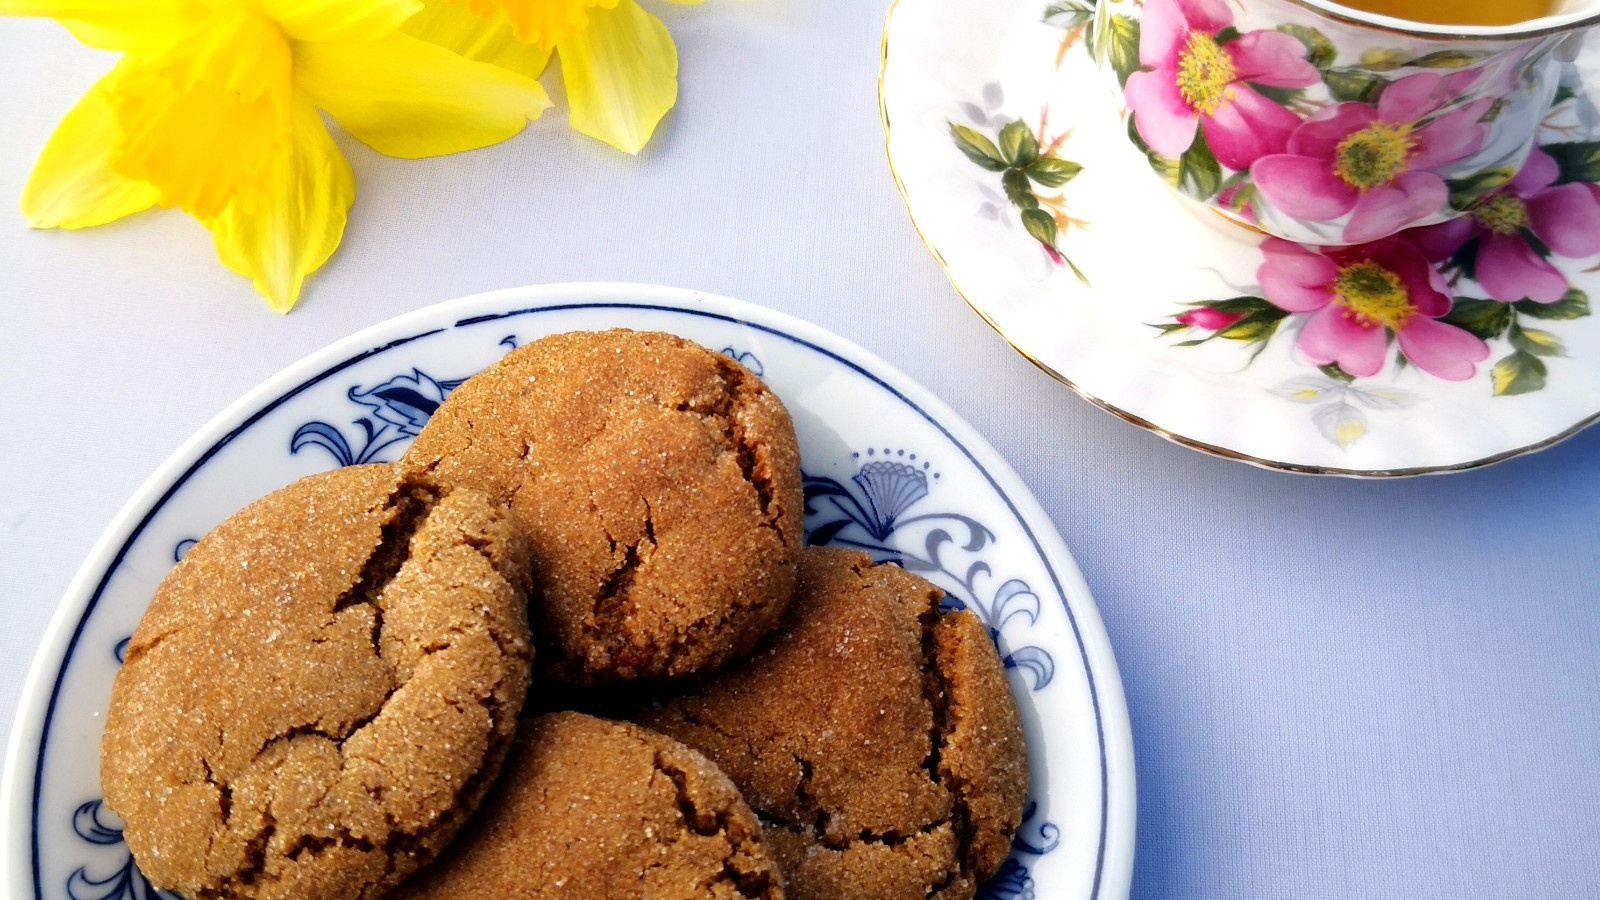 Image of Chewy Black Garlic Molasses Sugar Cookies